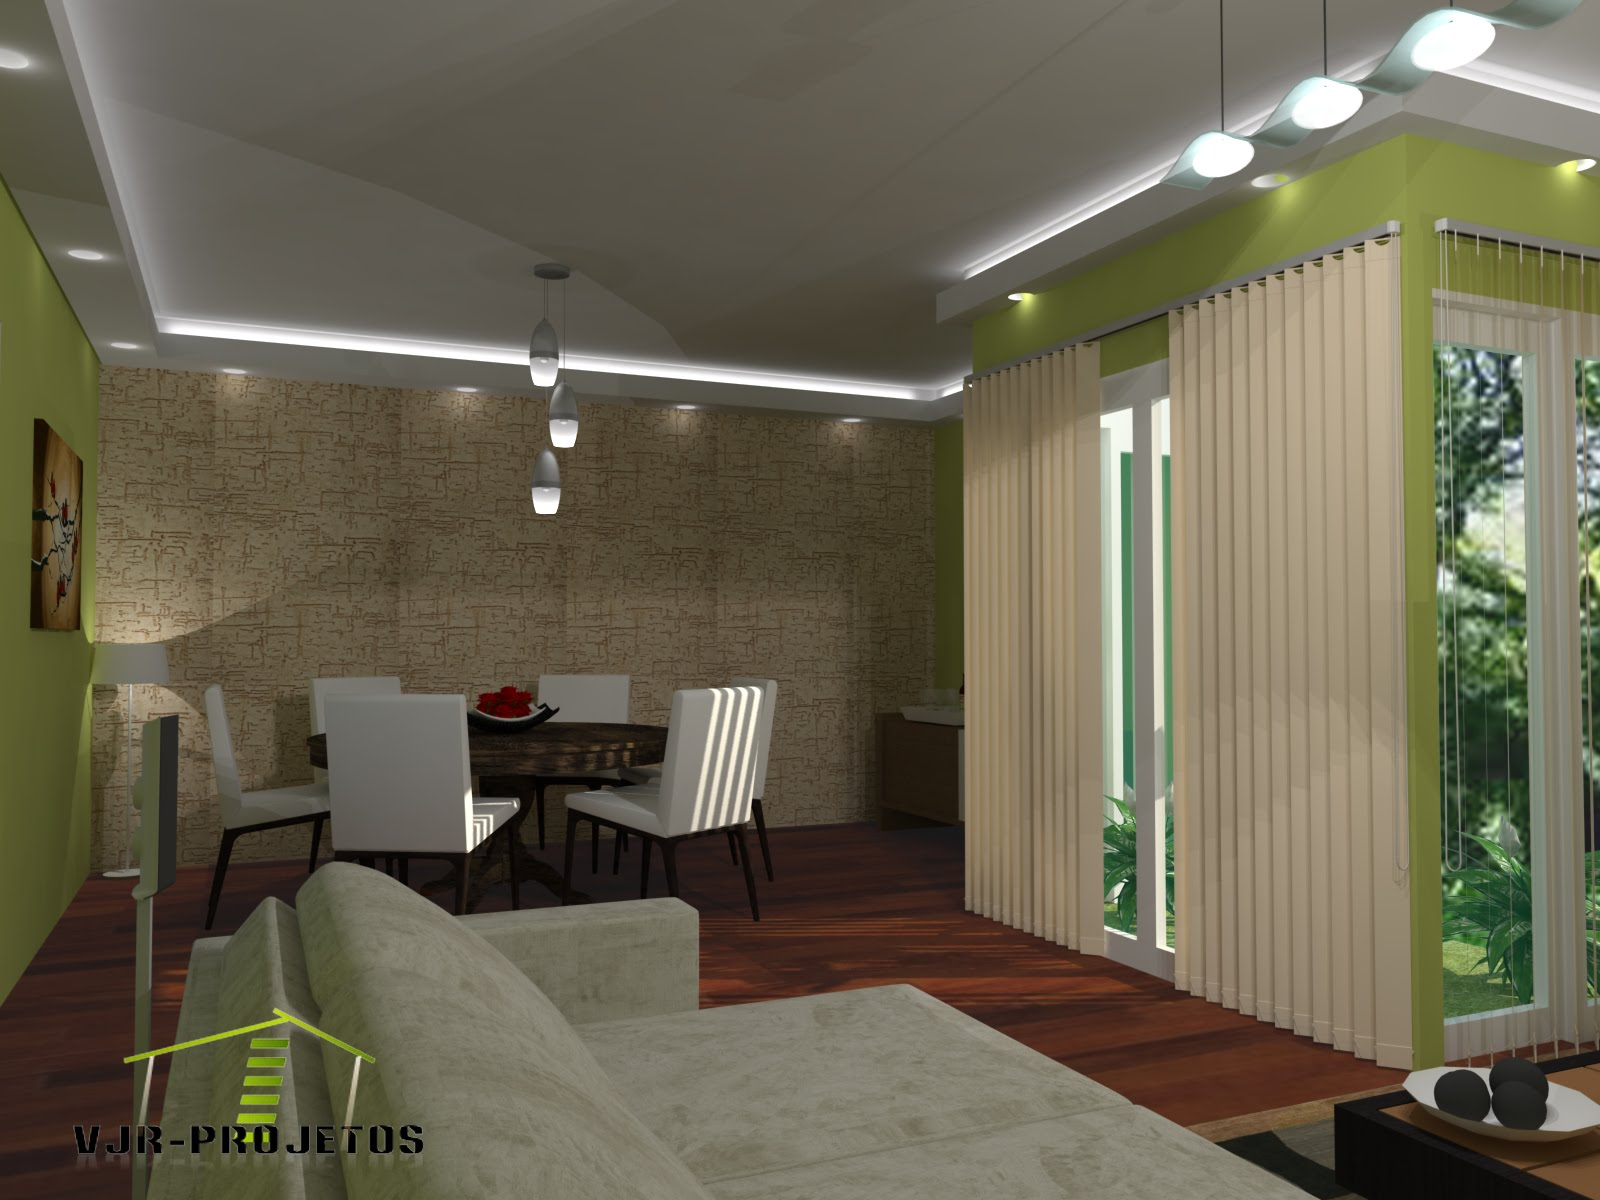 Sala de Jantar Conjugada Sala de Estar / Sketchup   Vray #4A5E38 1600 1200